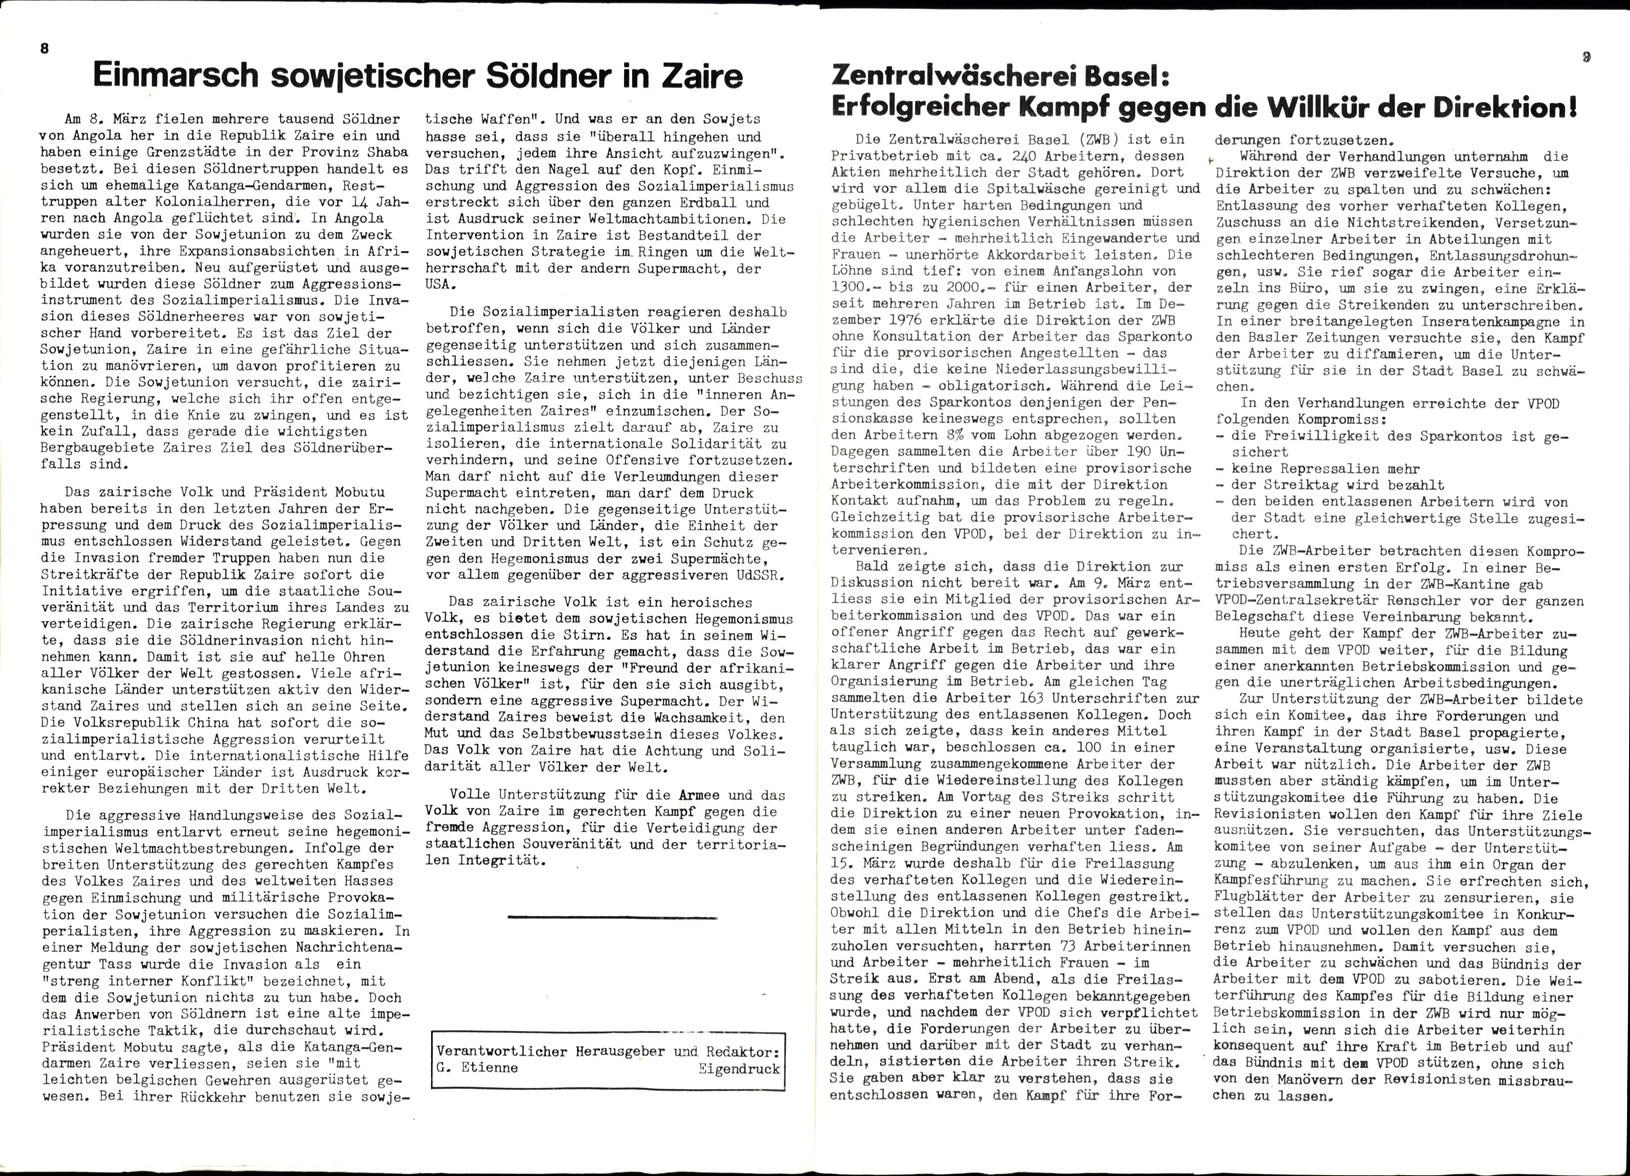 Schweiz_KPSML_Oktober_19770500_110_005